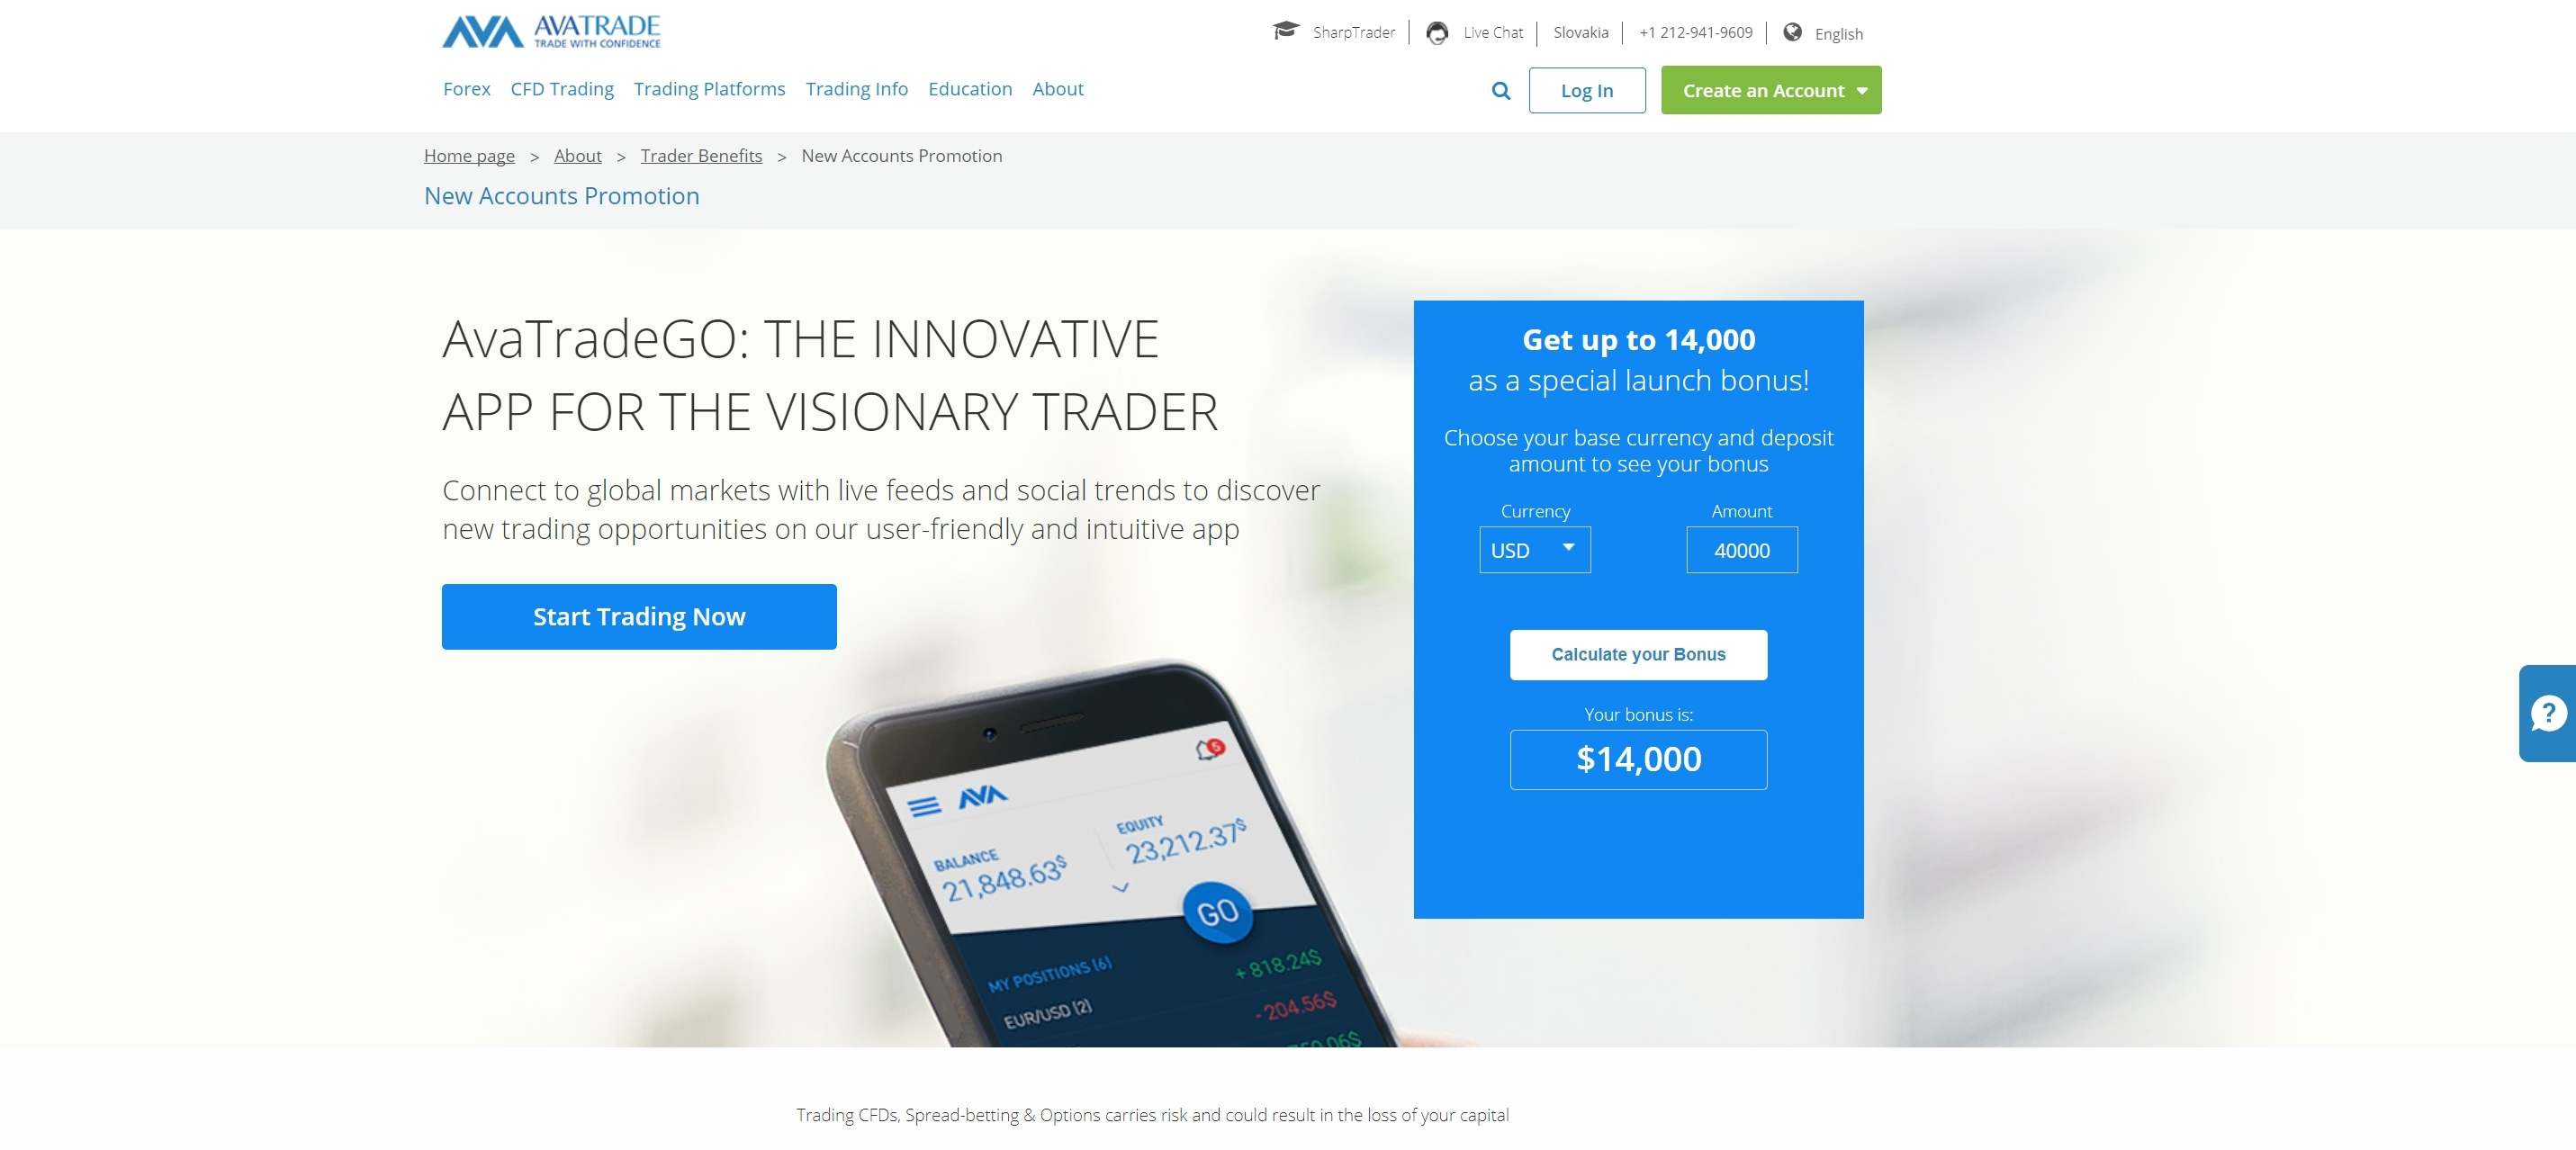 AvaTrade Homepage 2018